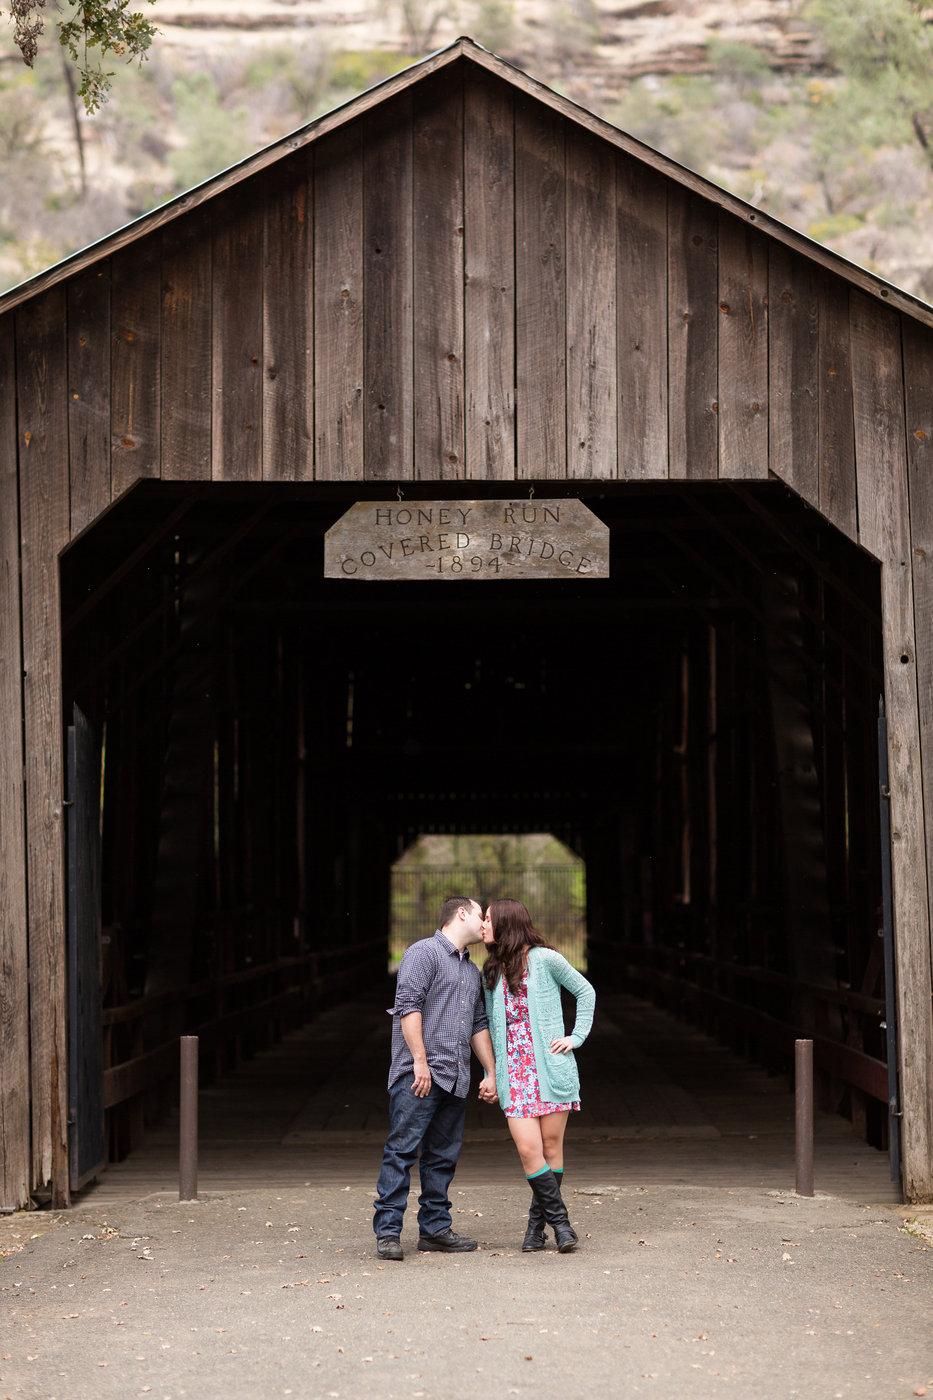 northern-california-paradise-honeyrun-covered-bridge-engagement-photography-session.jpg